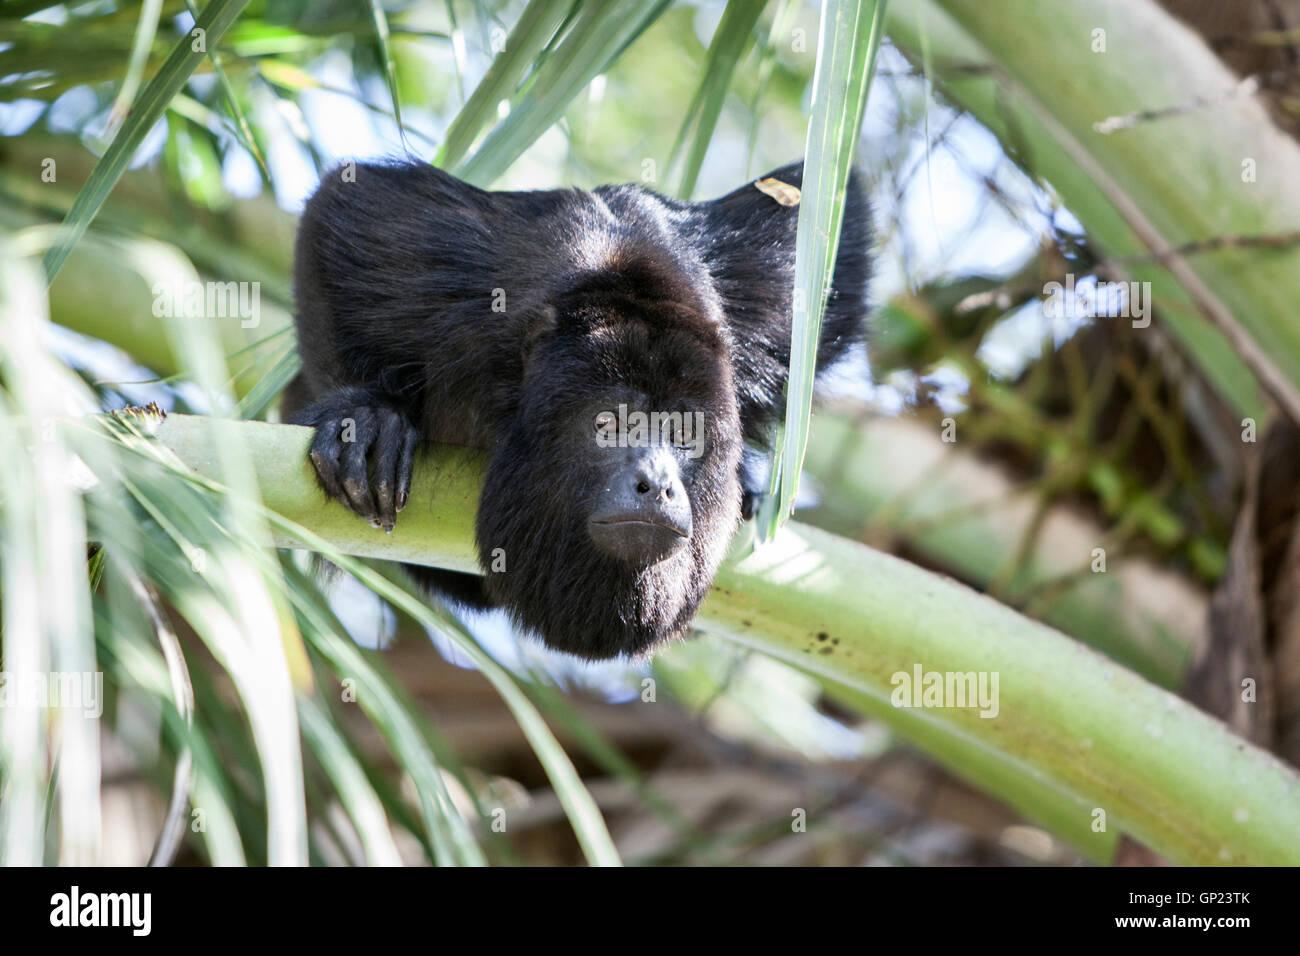 Black Howler Monkey, Alouatta pigra, Caribbean, Belize - Stock Image